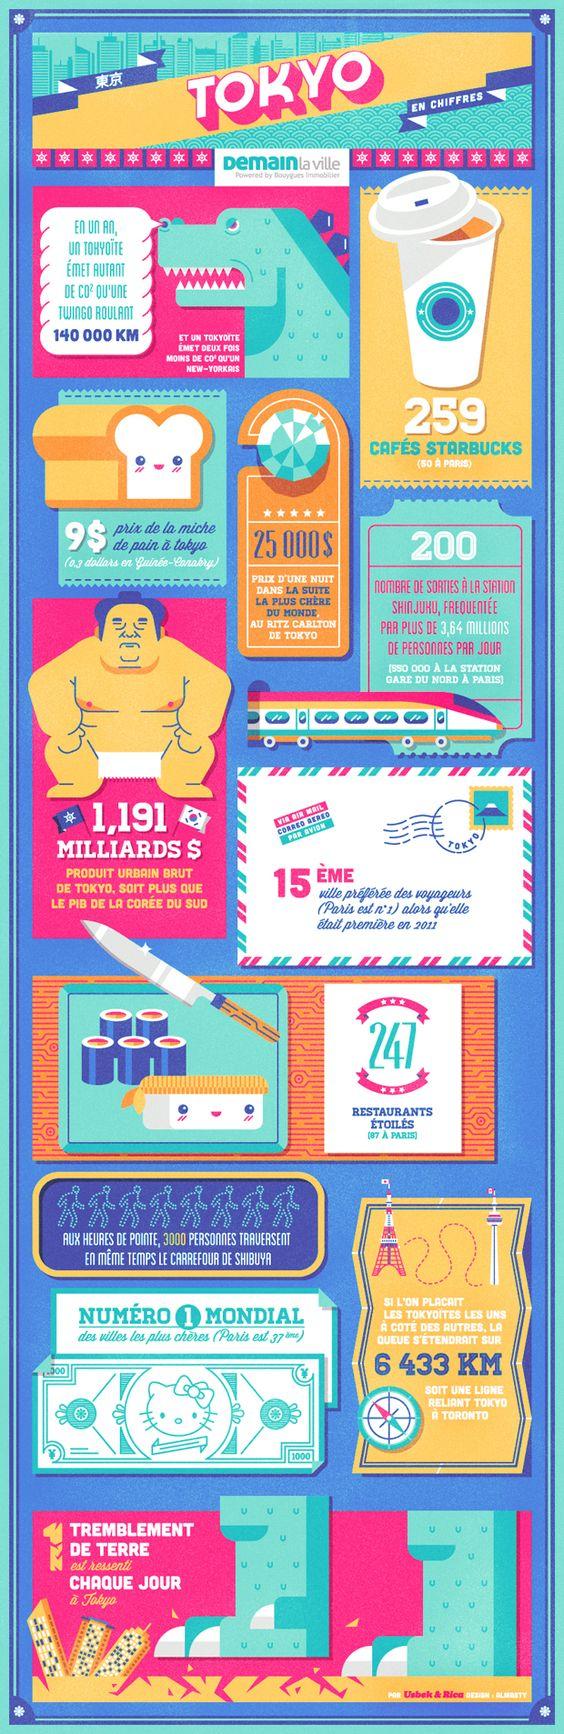 Fun colors. Color blocks separate facts/entries. Simple spot illustrations.